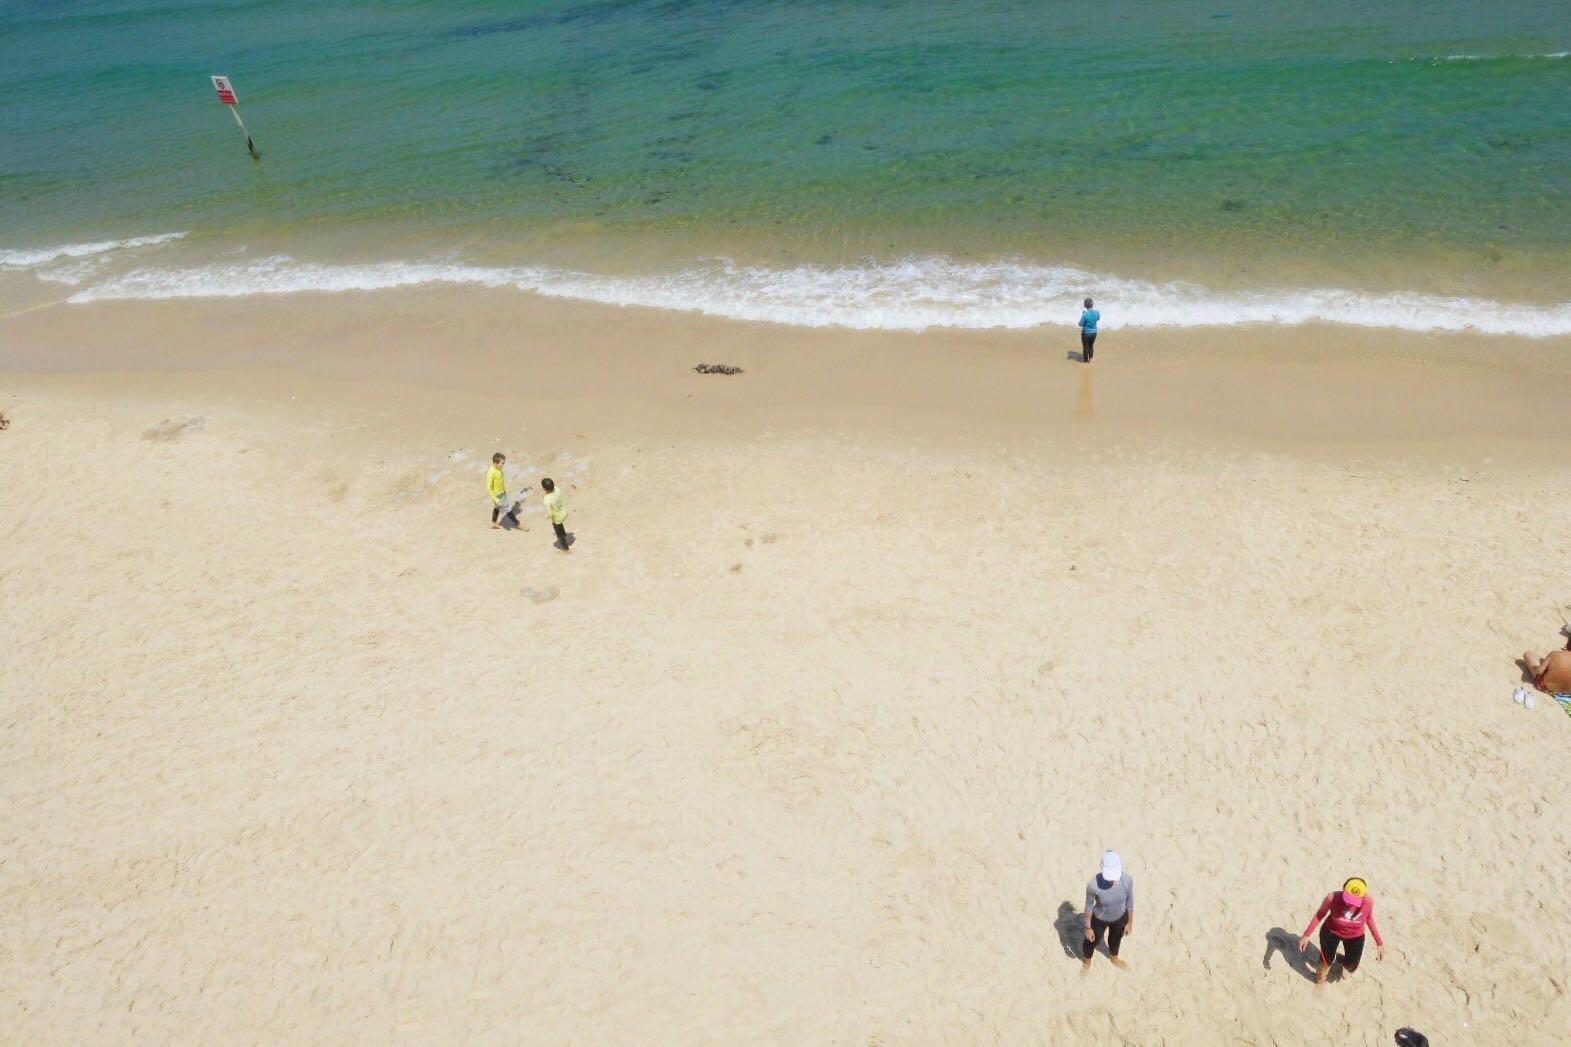 les-exploratrices-tel-aviv-israel-jaffa-beach